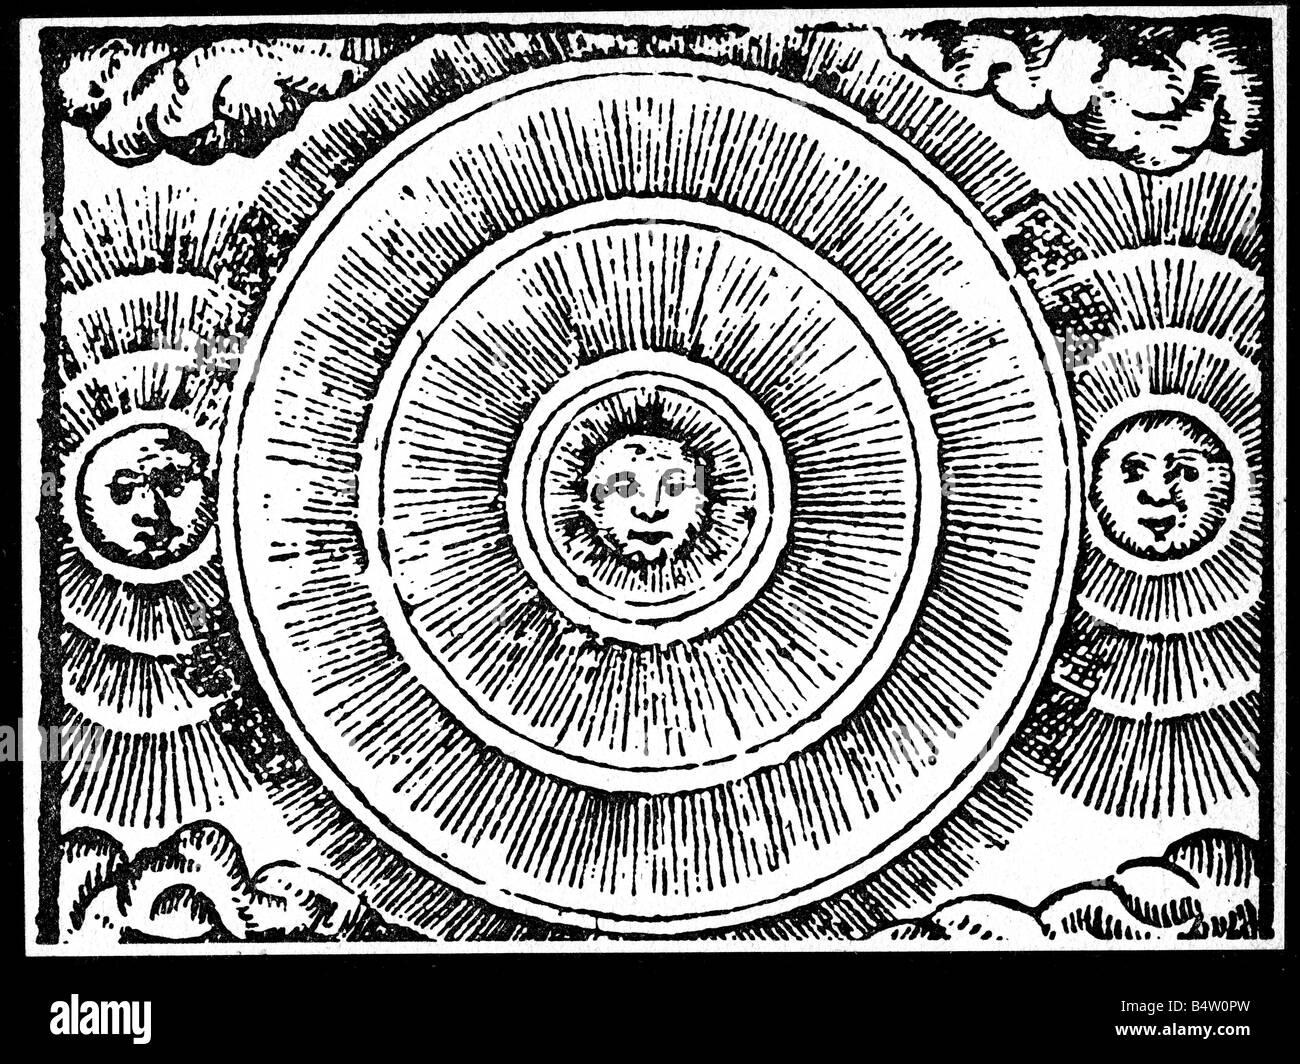 L'astronomie, sun, sun dogs gravure sur bois, 'Historia de Gentibus septentrionalibus' par Olaus Magnus, Photo Stock